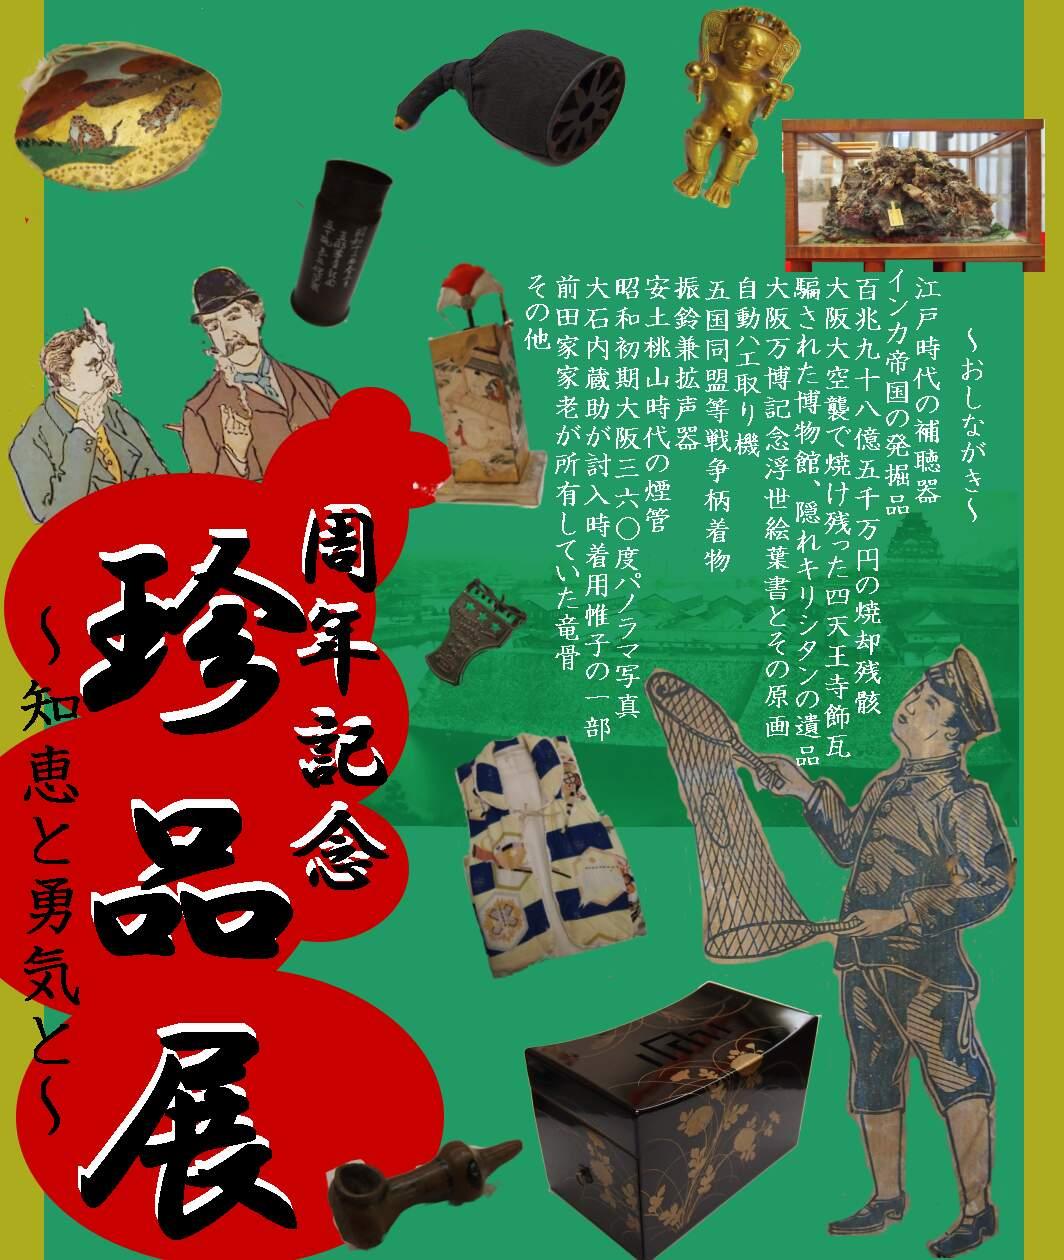 1/12~12/15   周年記念 珍品展:コヤノ美術館西脇館